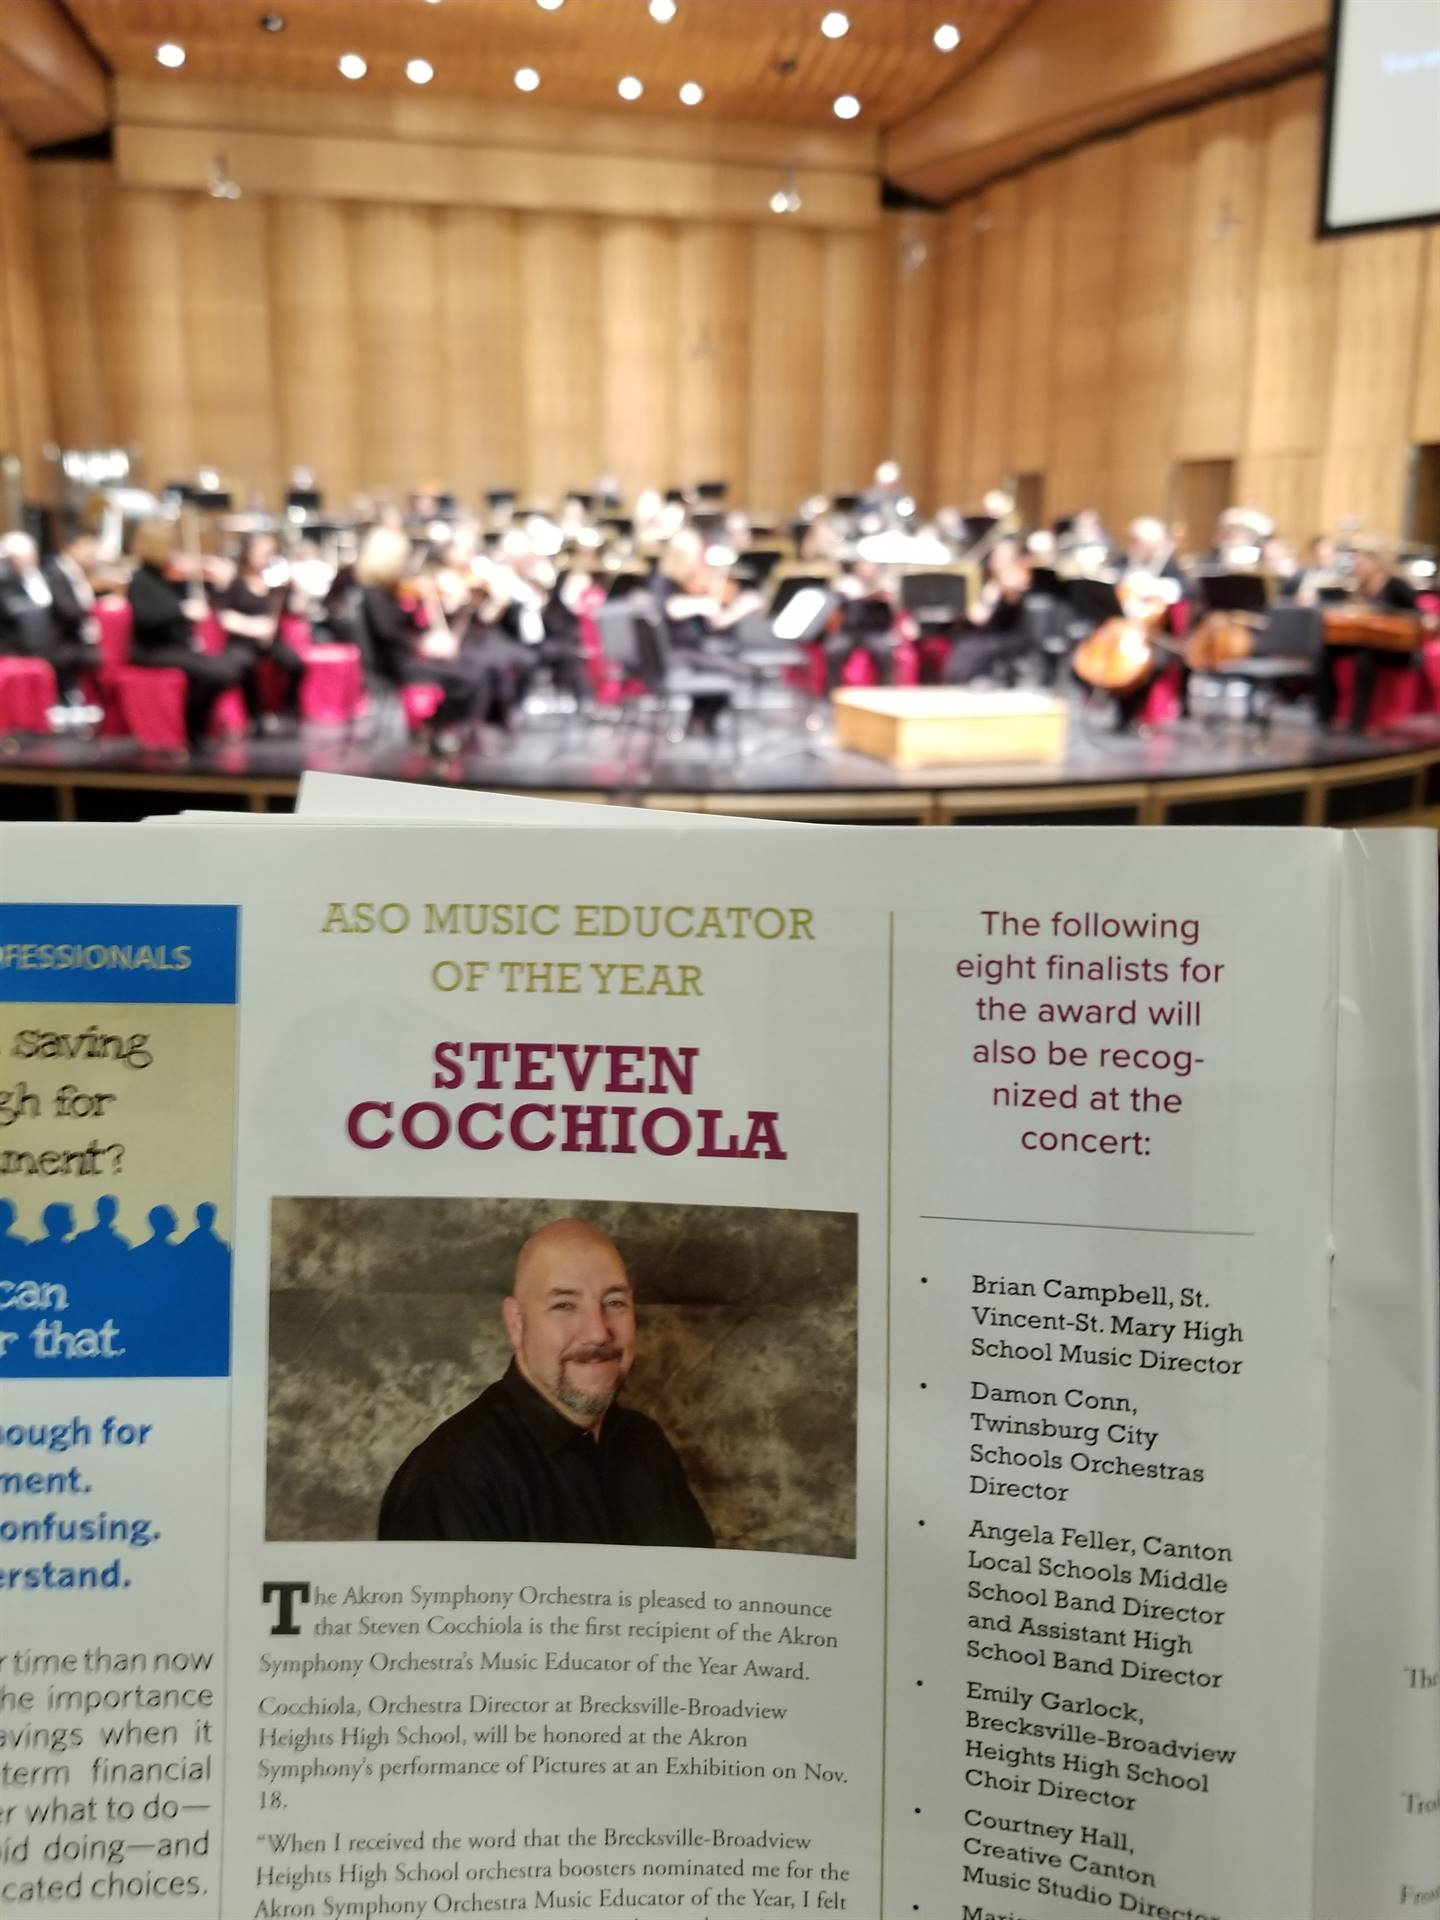 Congratulations Steve Cocchiola!